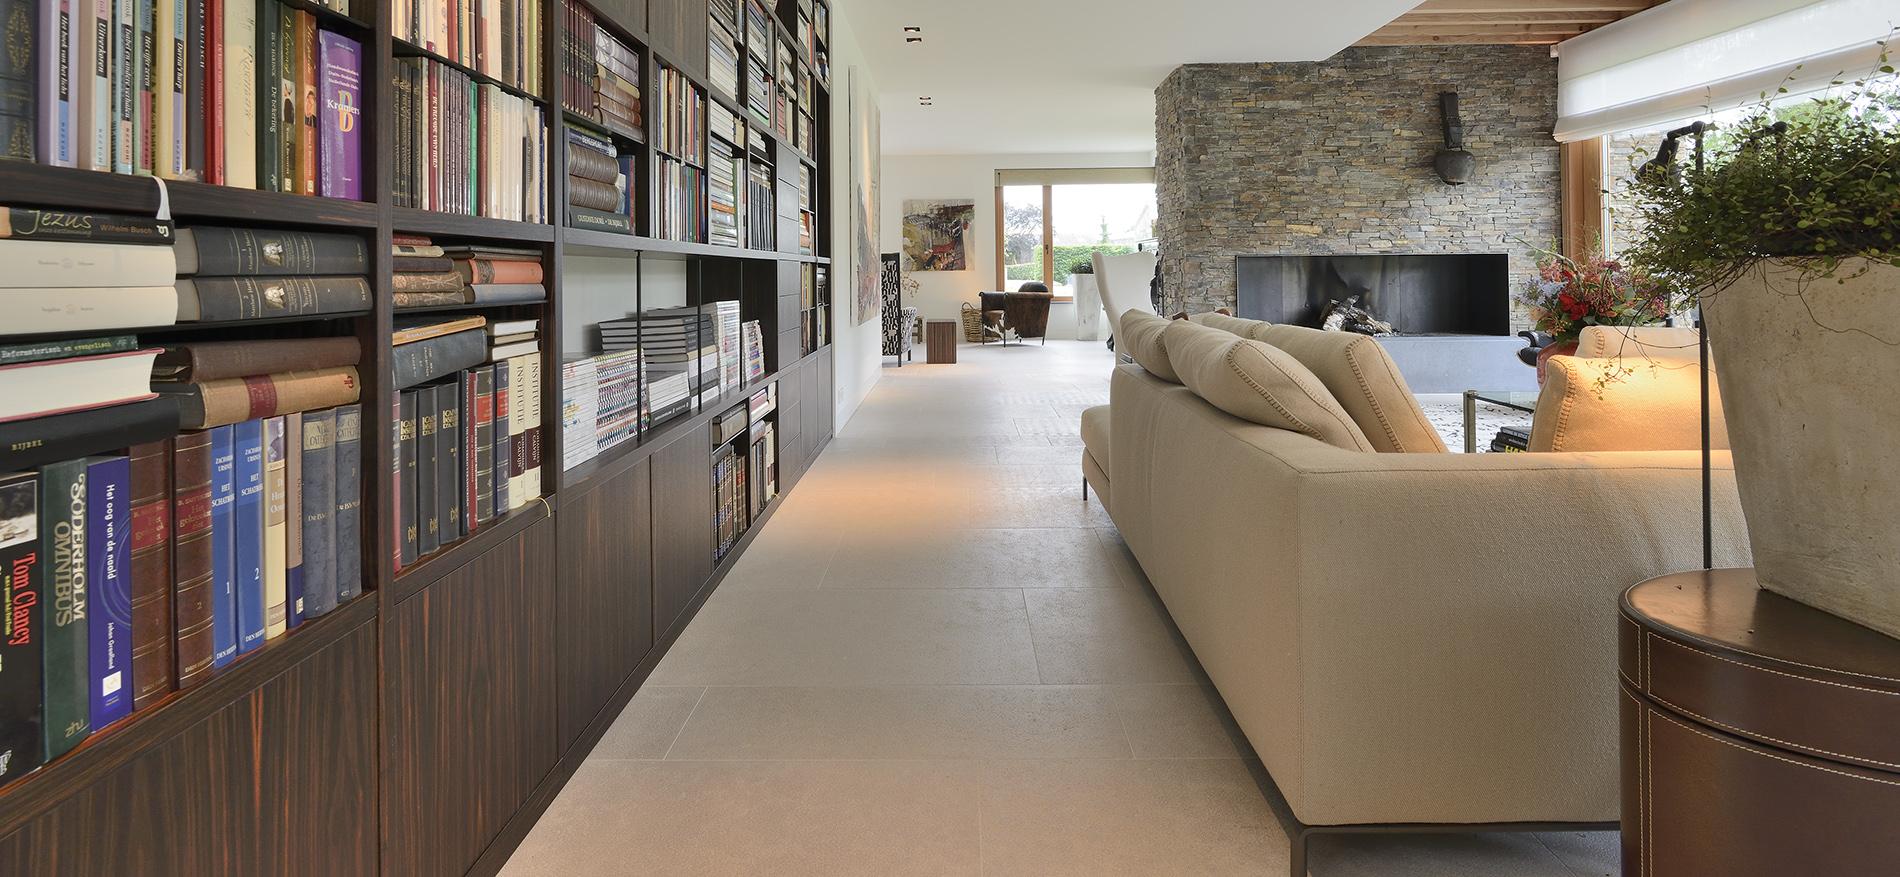 Design Interior And Exterior Villa Wsb Shopfitting